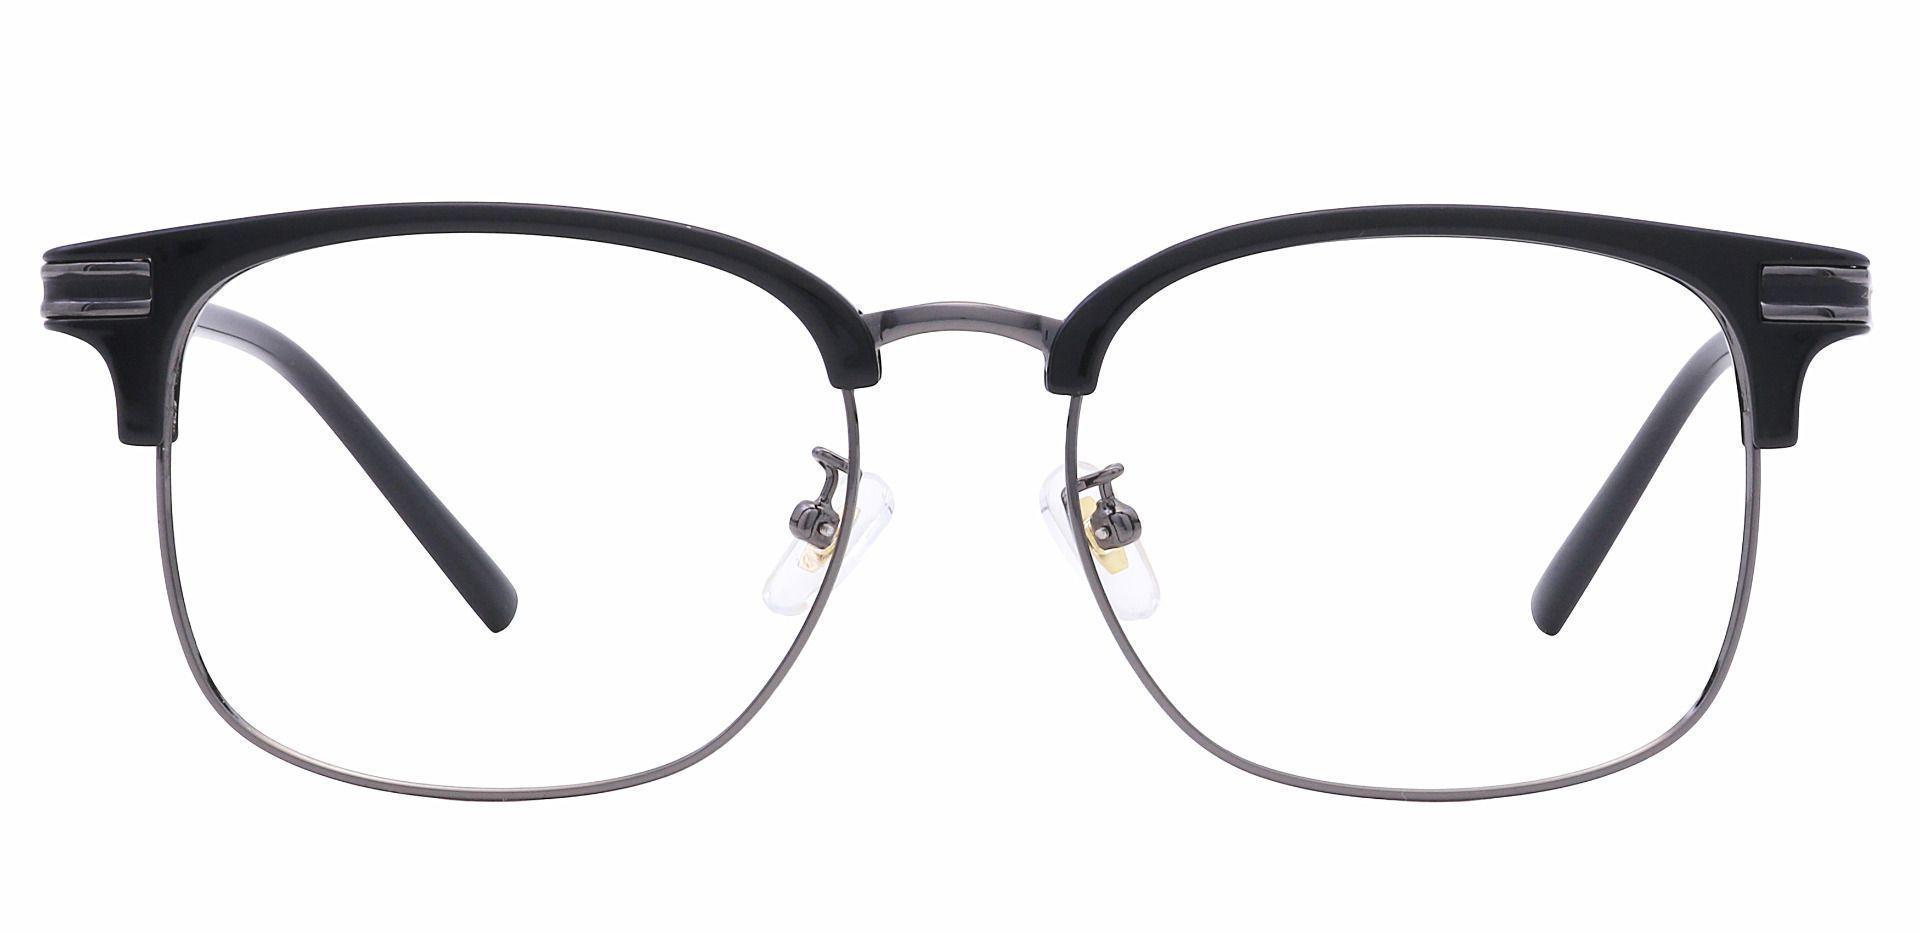 Cafe Browline Prescription Glasses - Black